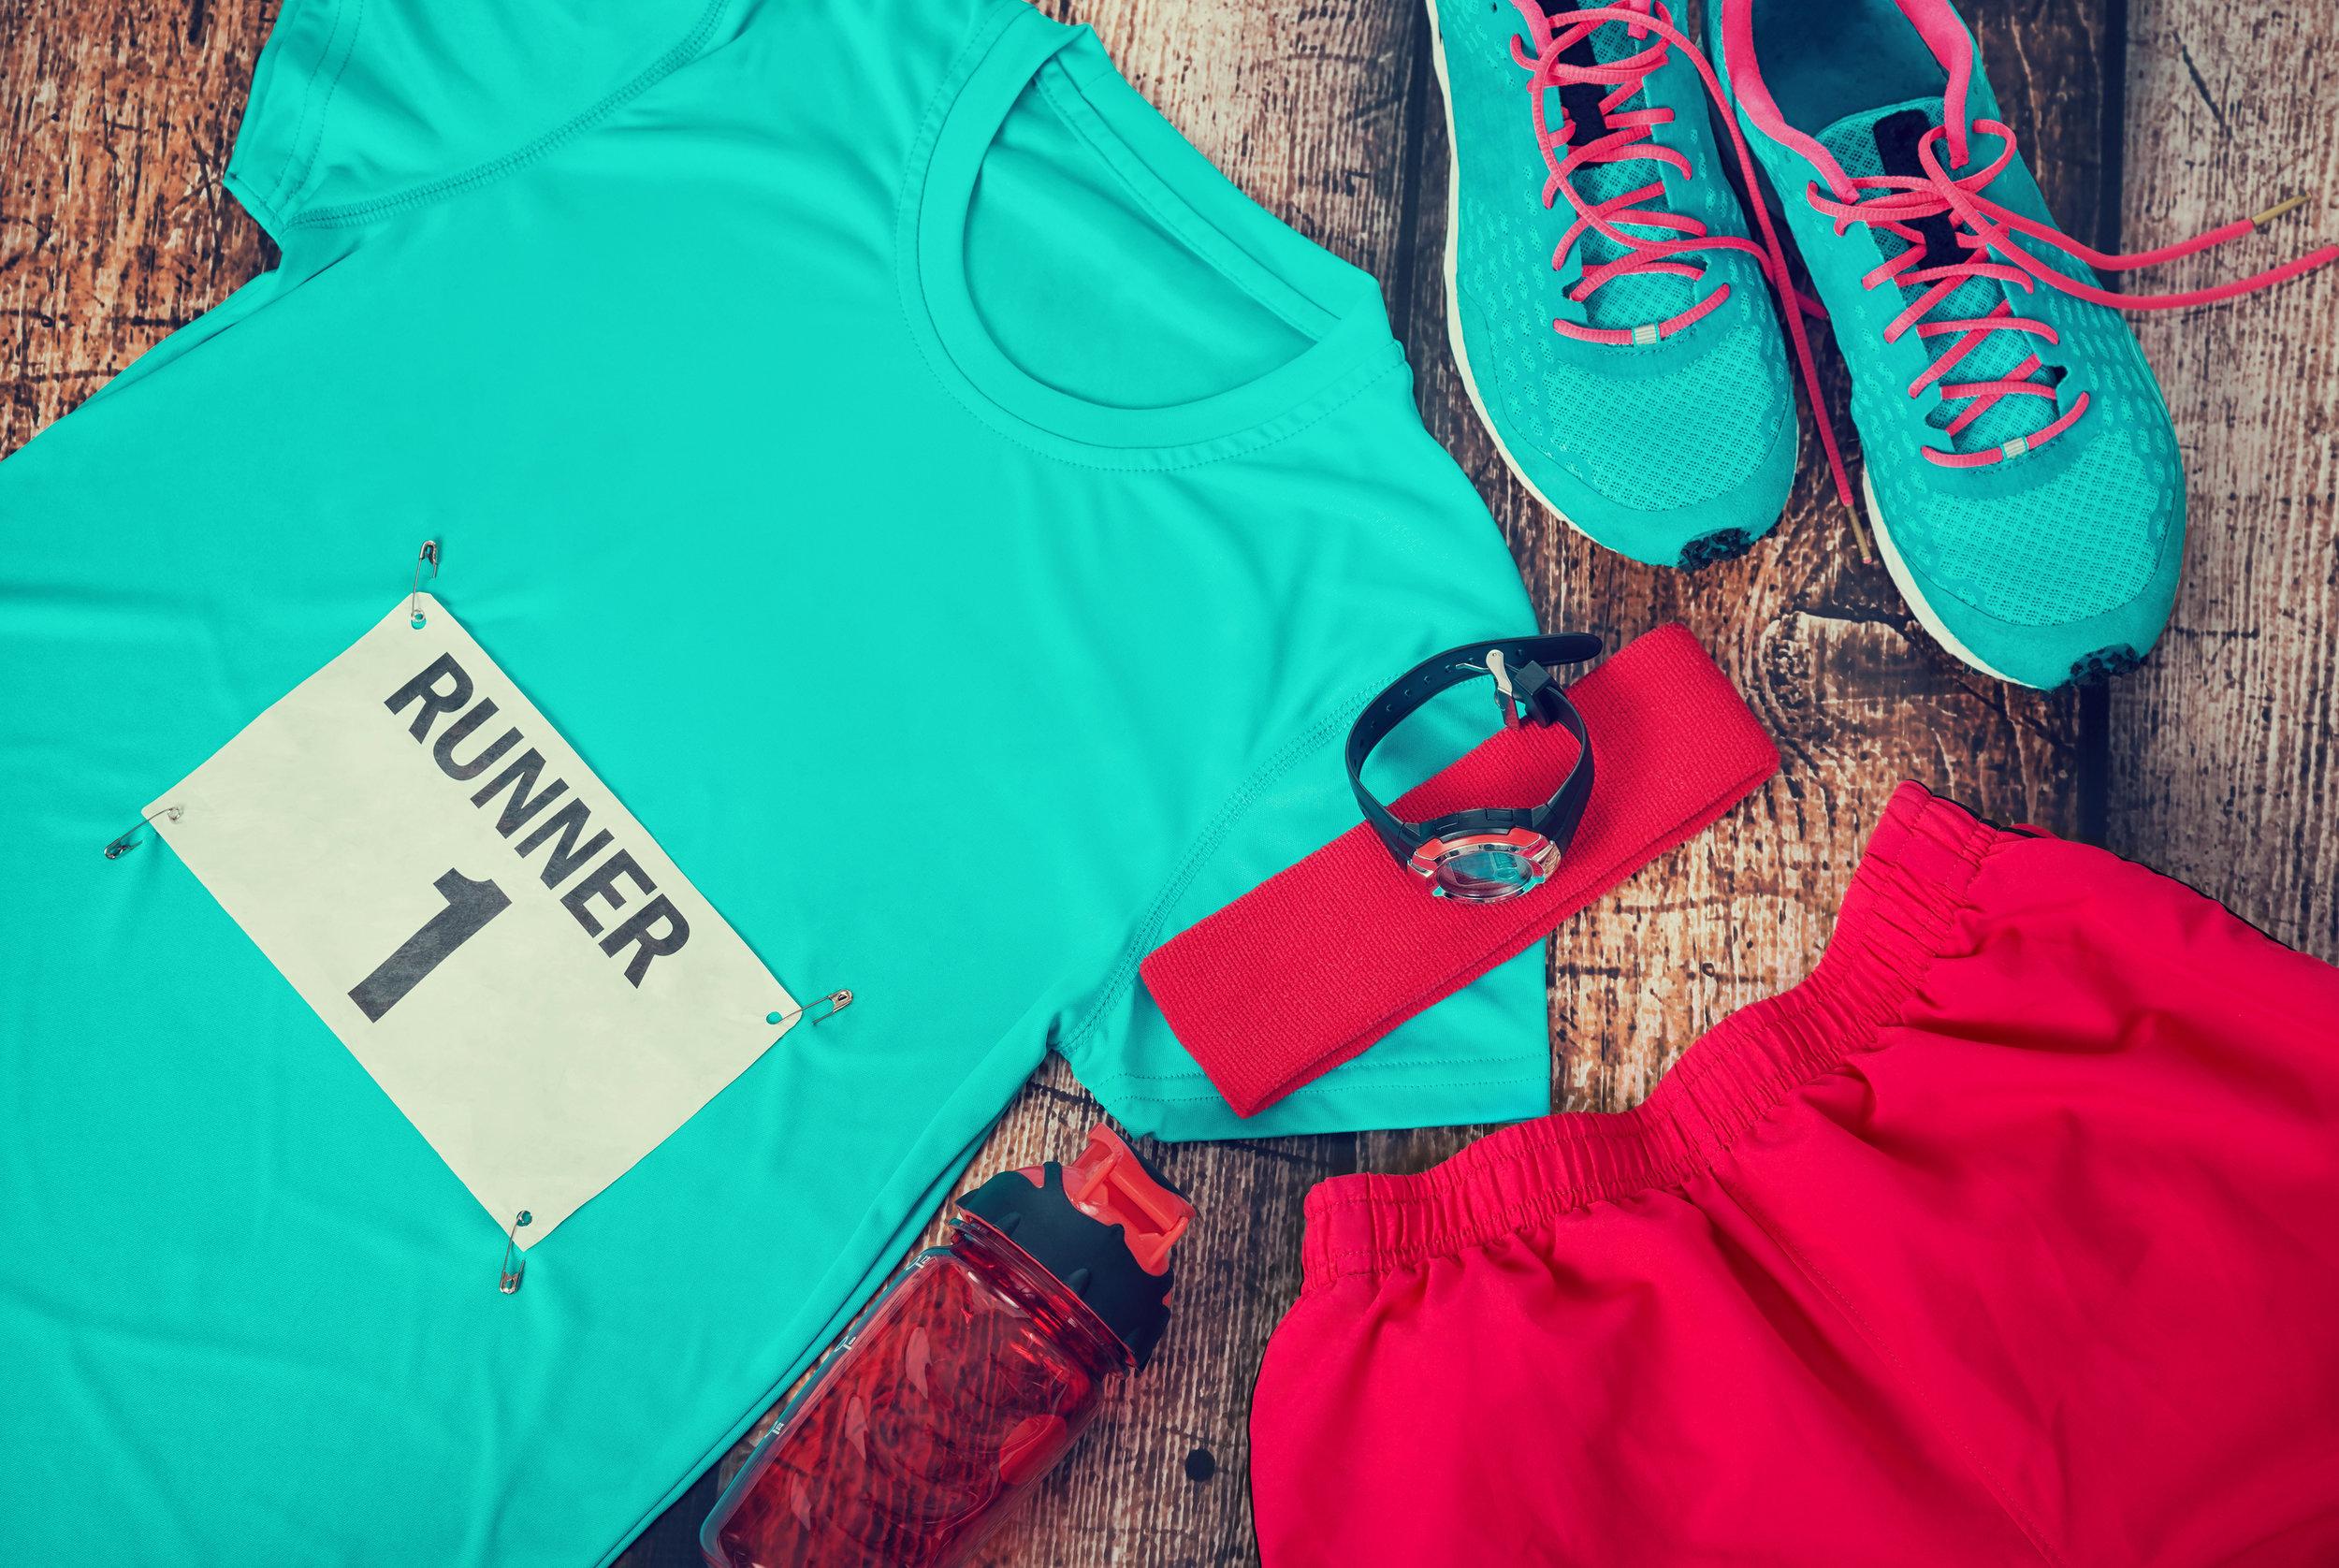 Running Club Melbourne Derbyshire